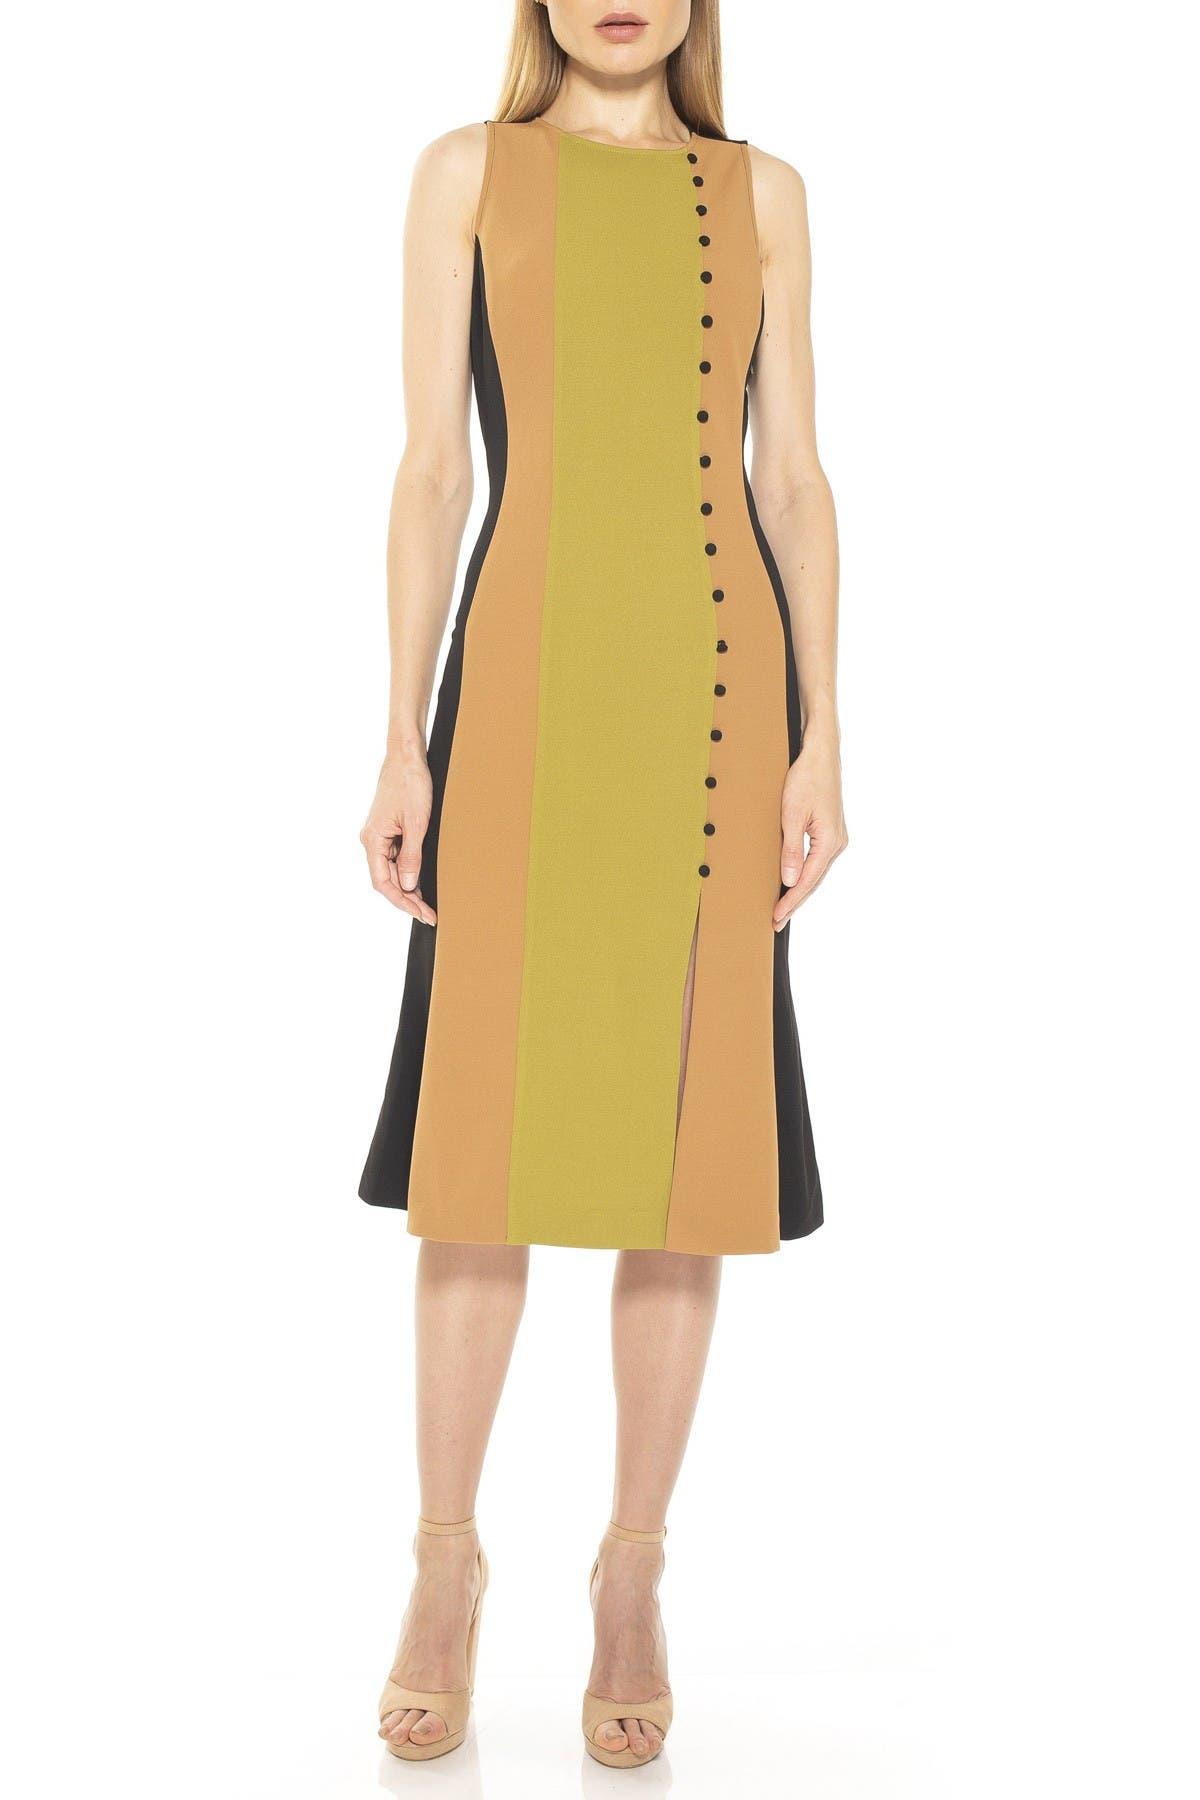 Image of Alexia Admor Anna Colorblock Slit Midi Dress